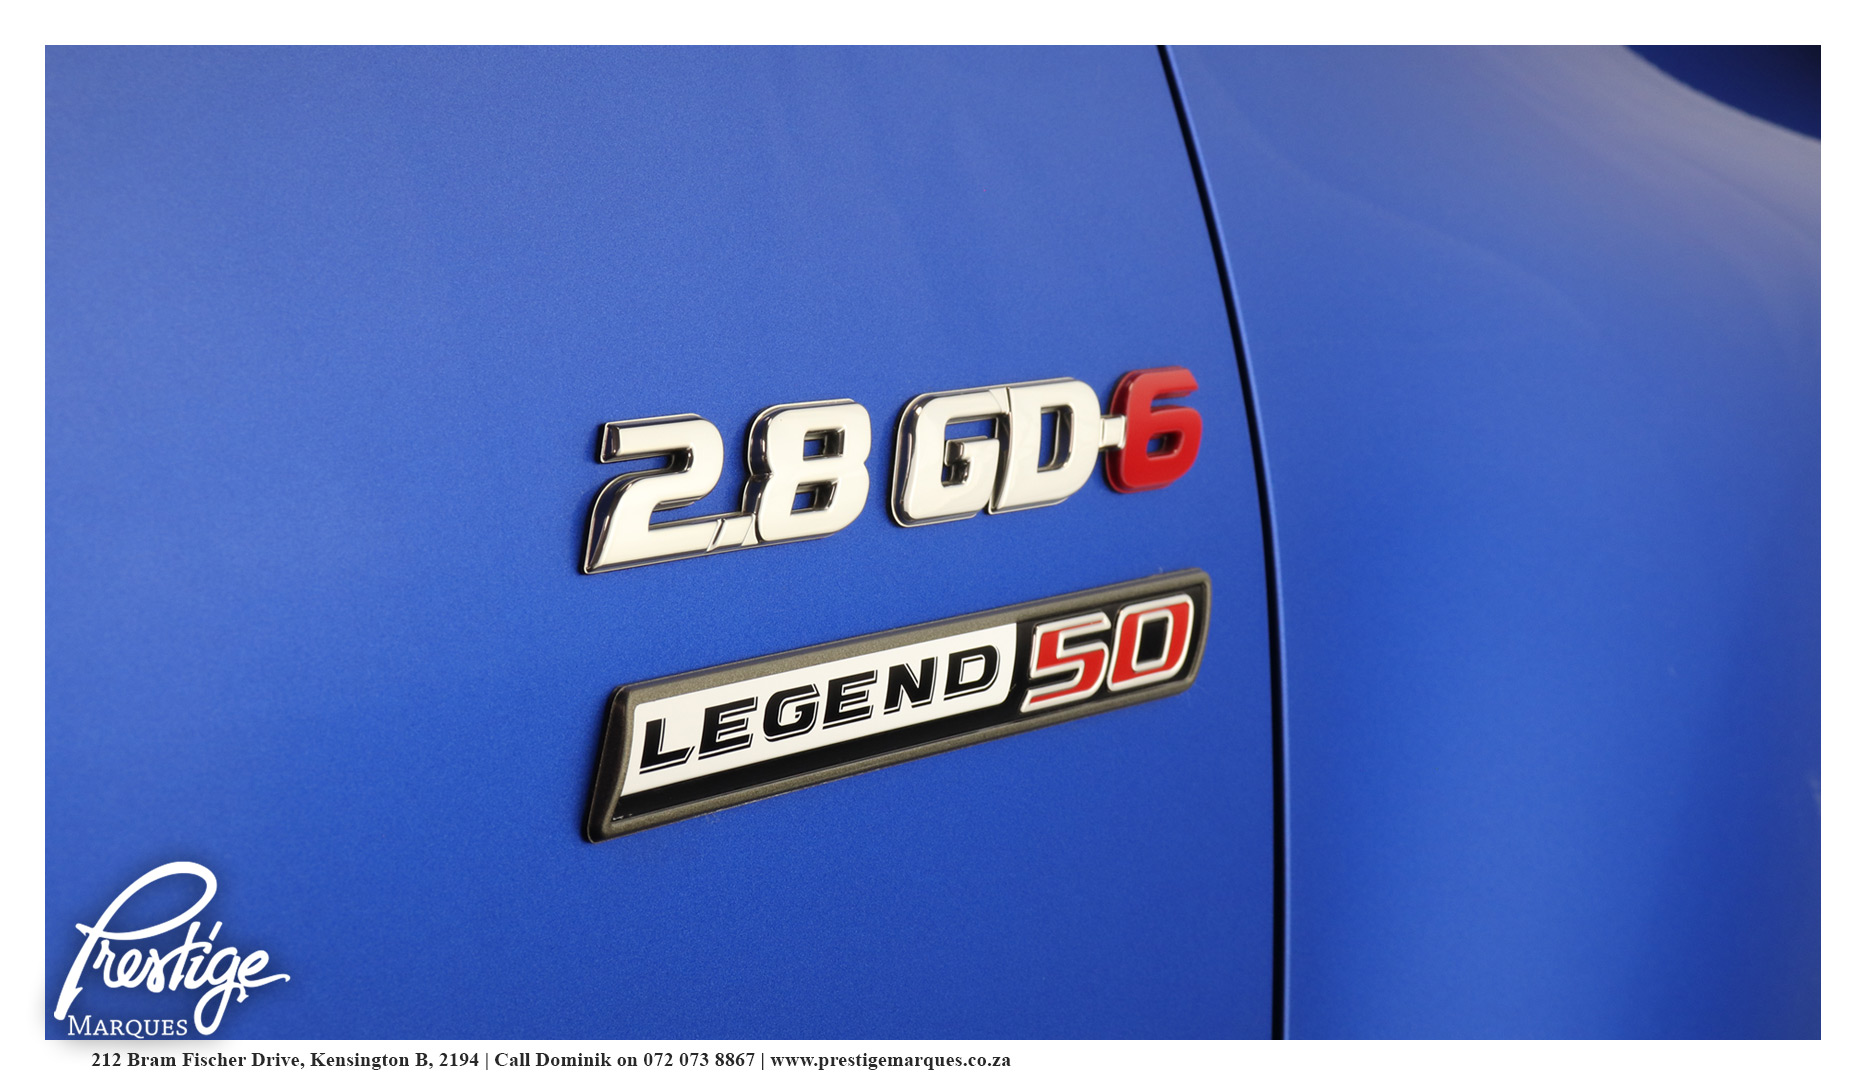 2020-Toyota-Hilux-2X2-50-Legened-Auto-Prestige-Marques-Randburg-Sandton-10